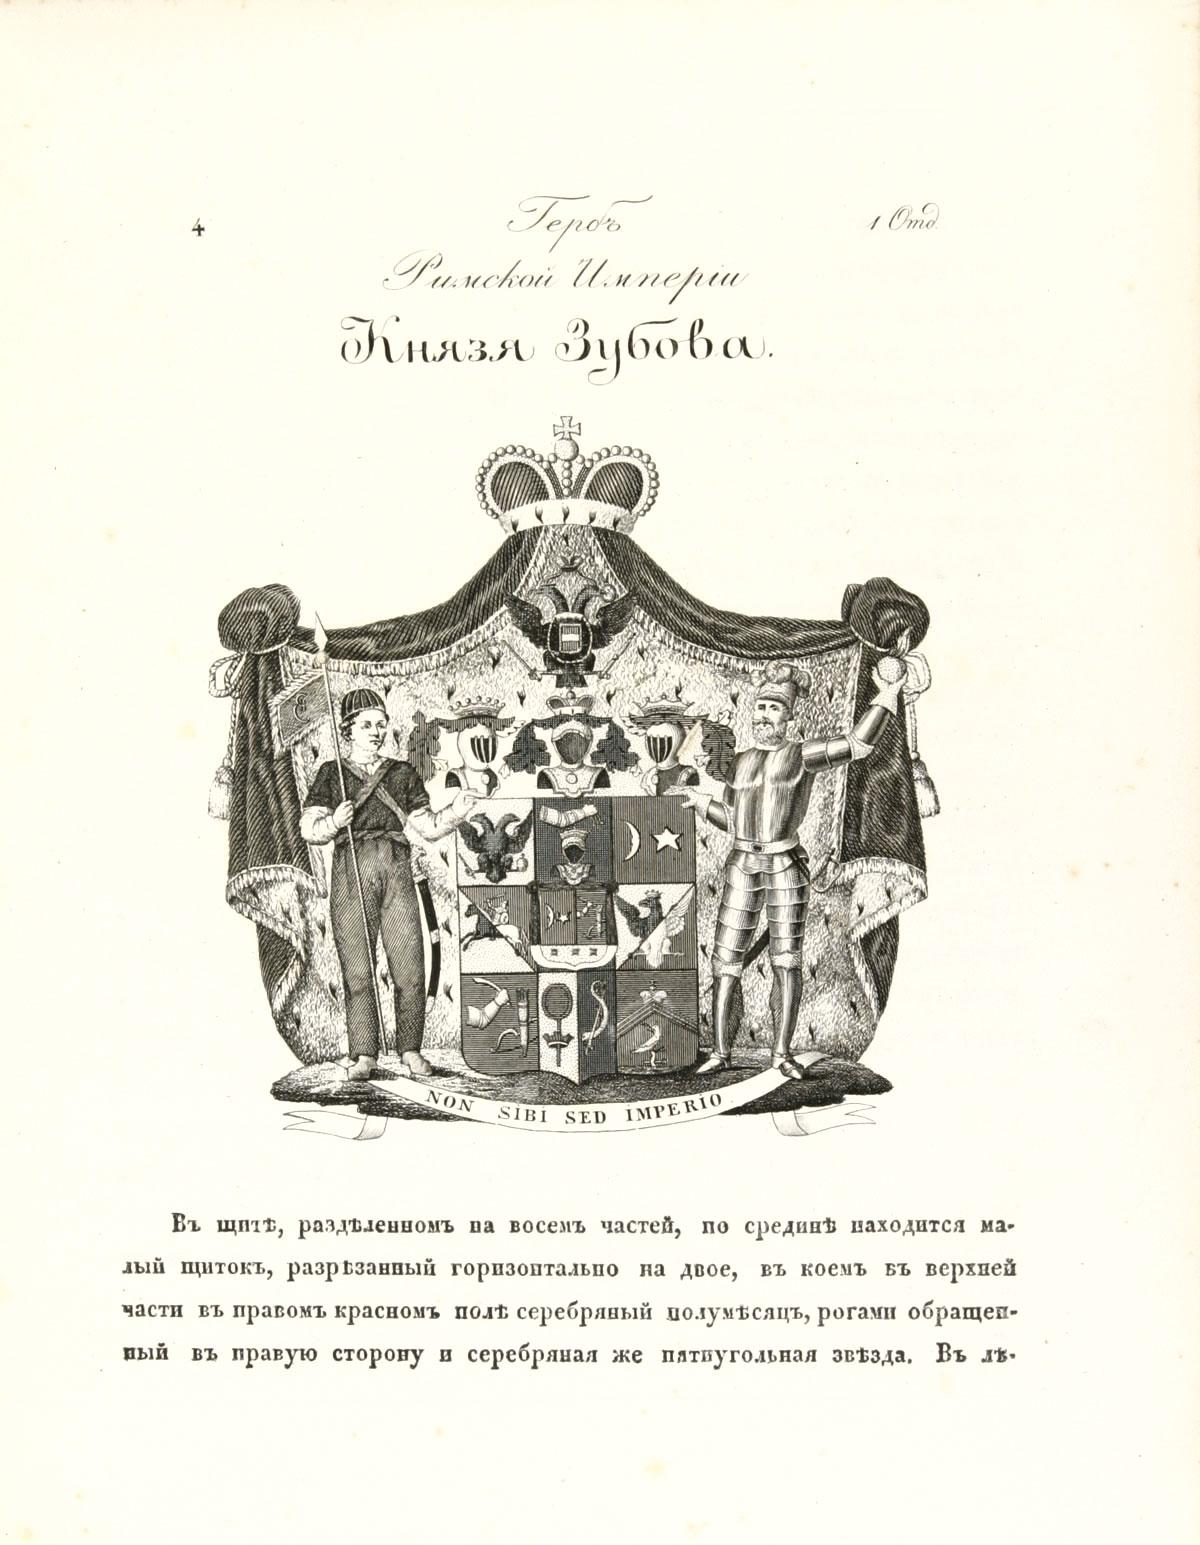 Герб Римской Империи князя Зубова, стр. 1